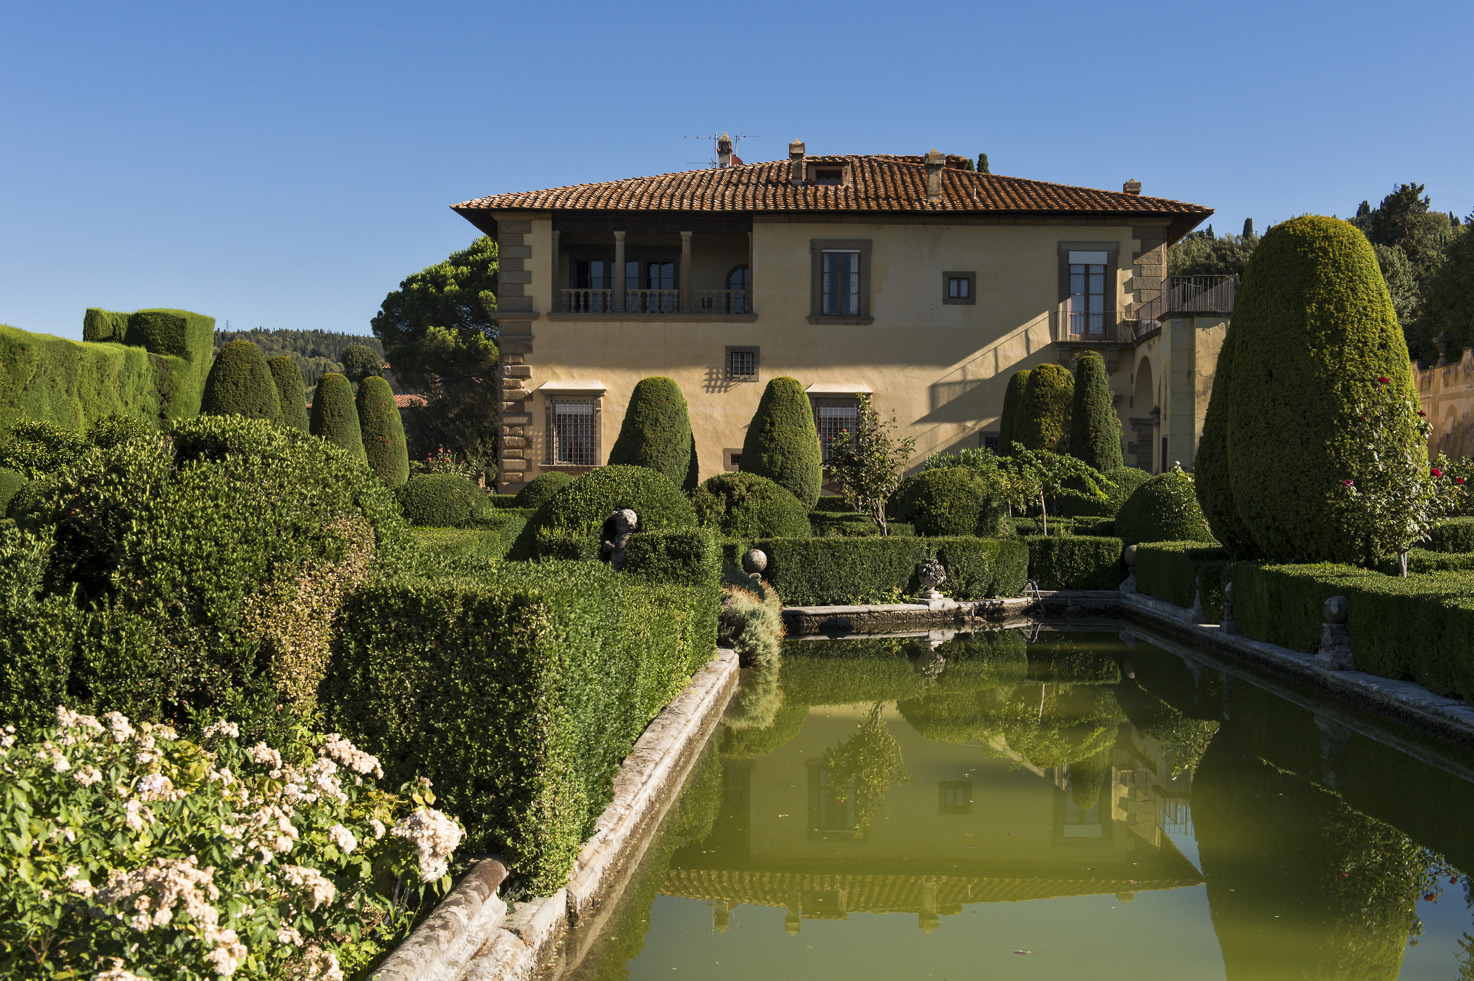 Villa Gamberaia, Florence